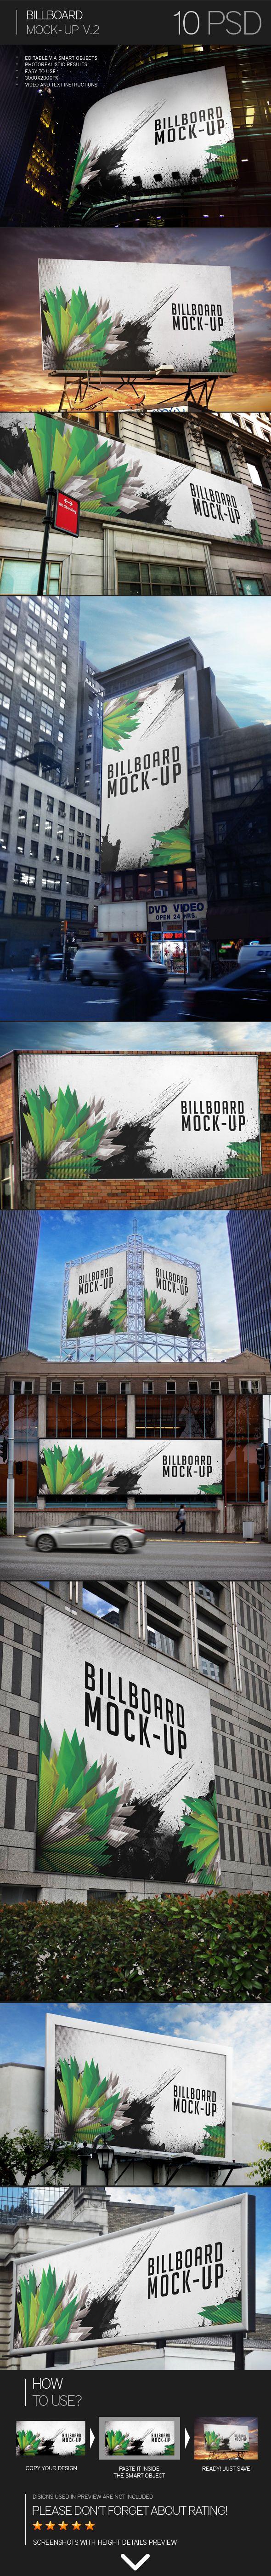 Billboard Mock-Up Vol.2 by Eugene Smith, via Behance